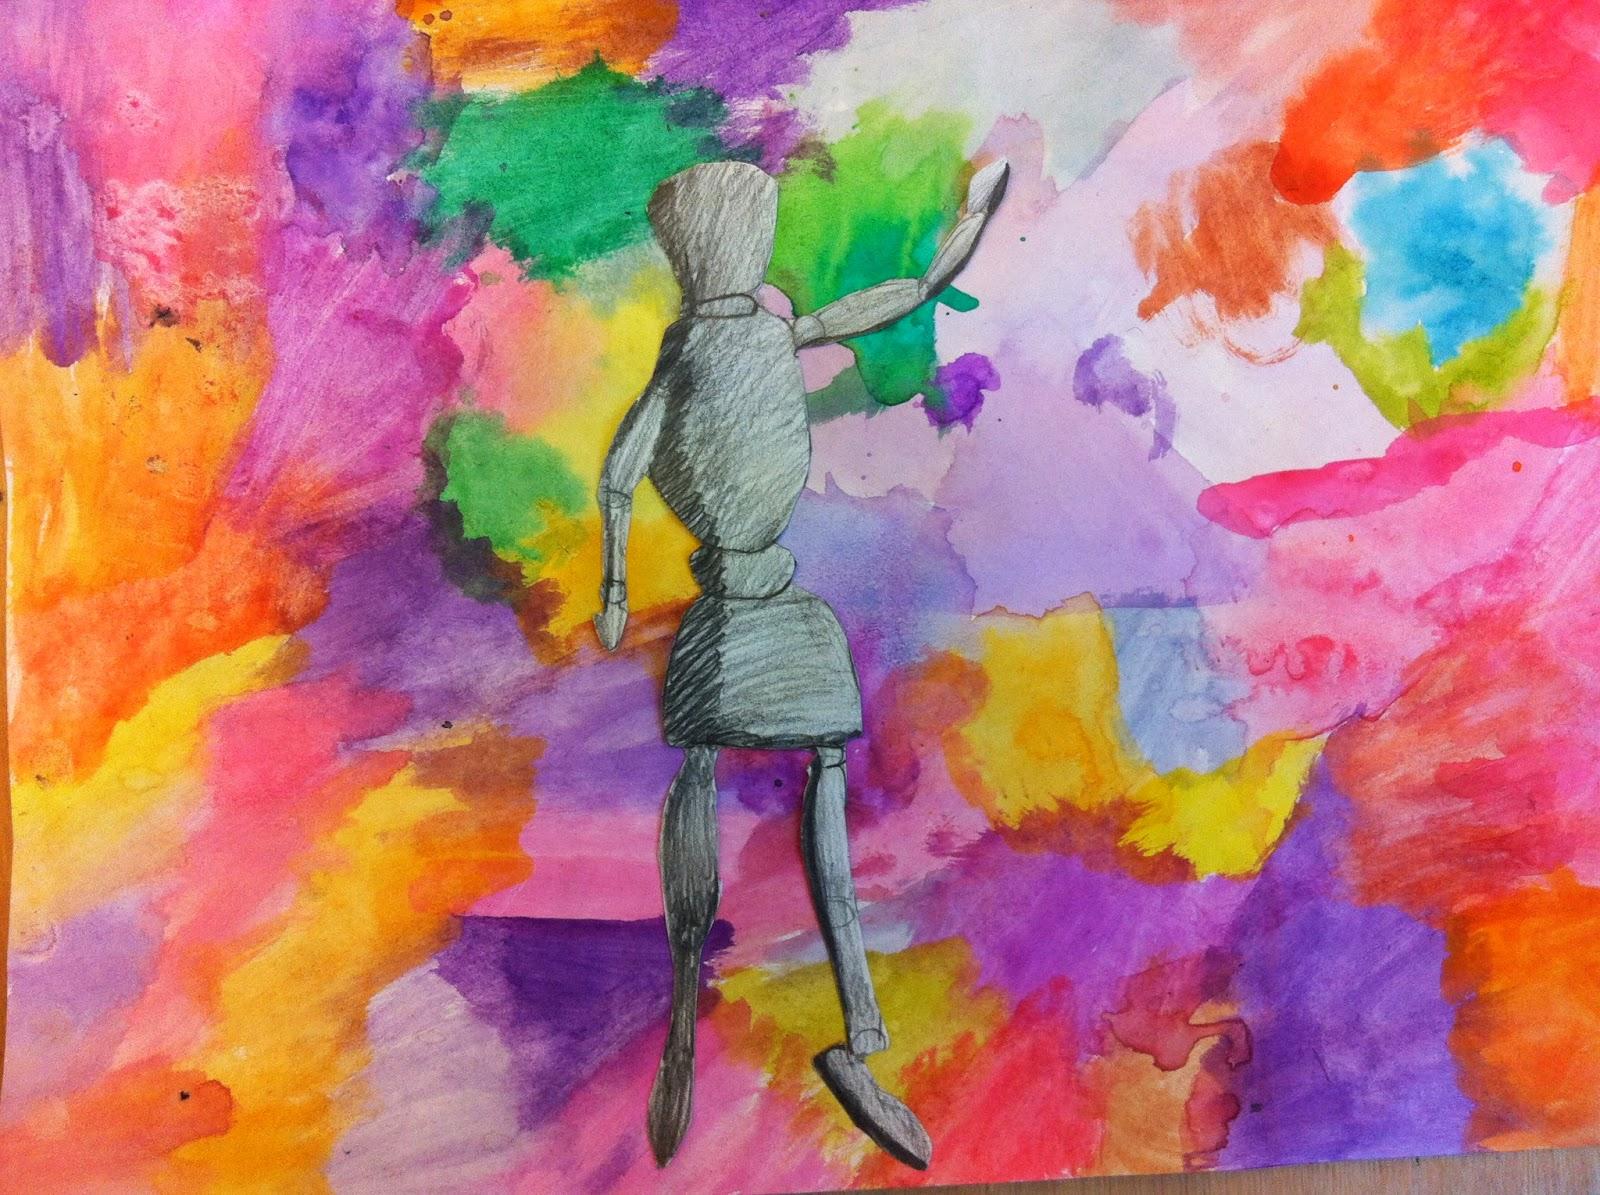 Language Movement Drawing to Draw The Human Figure